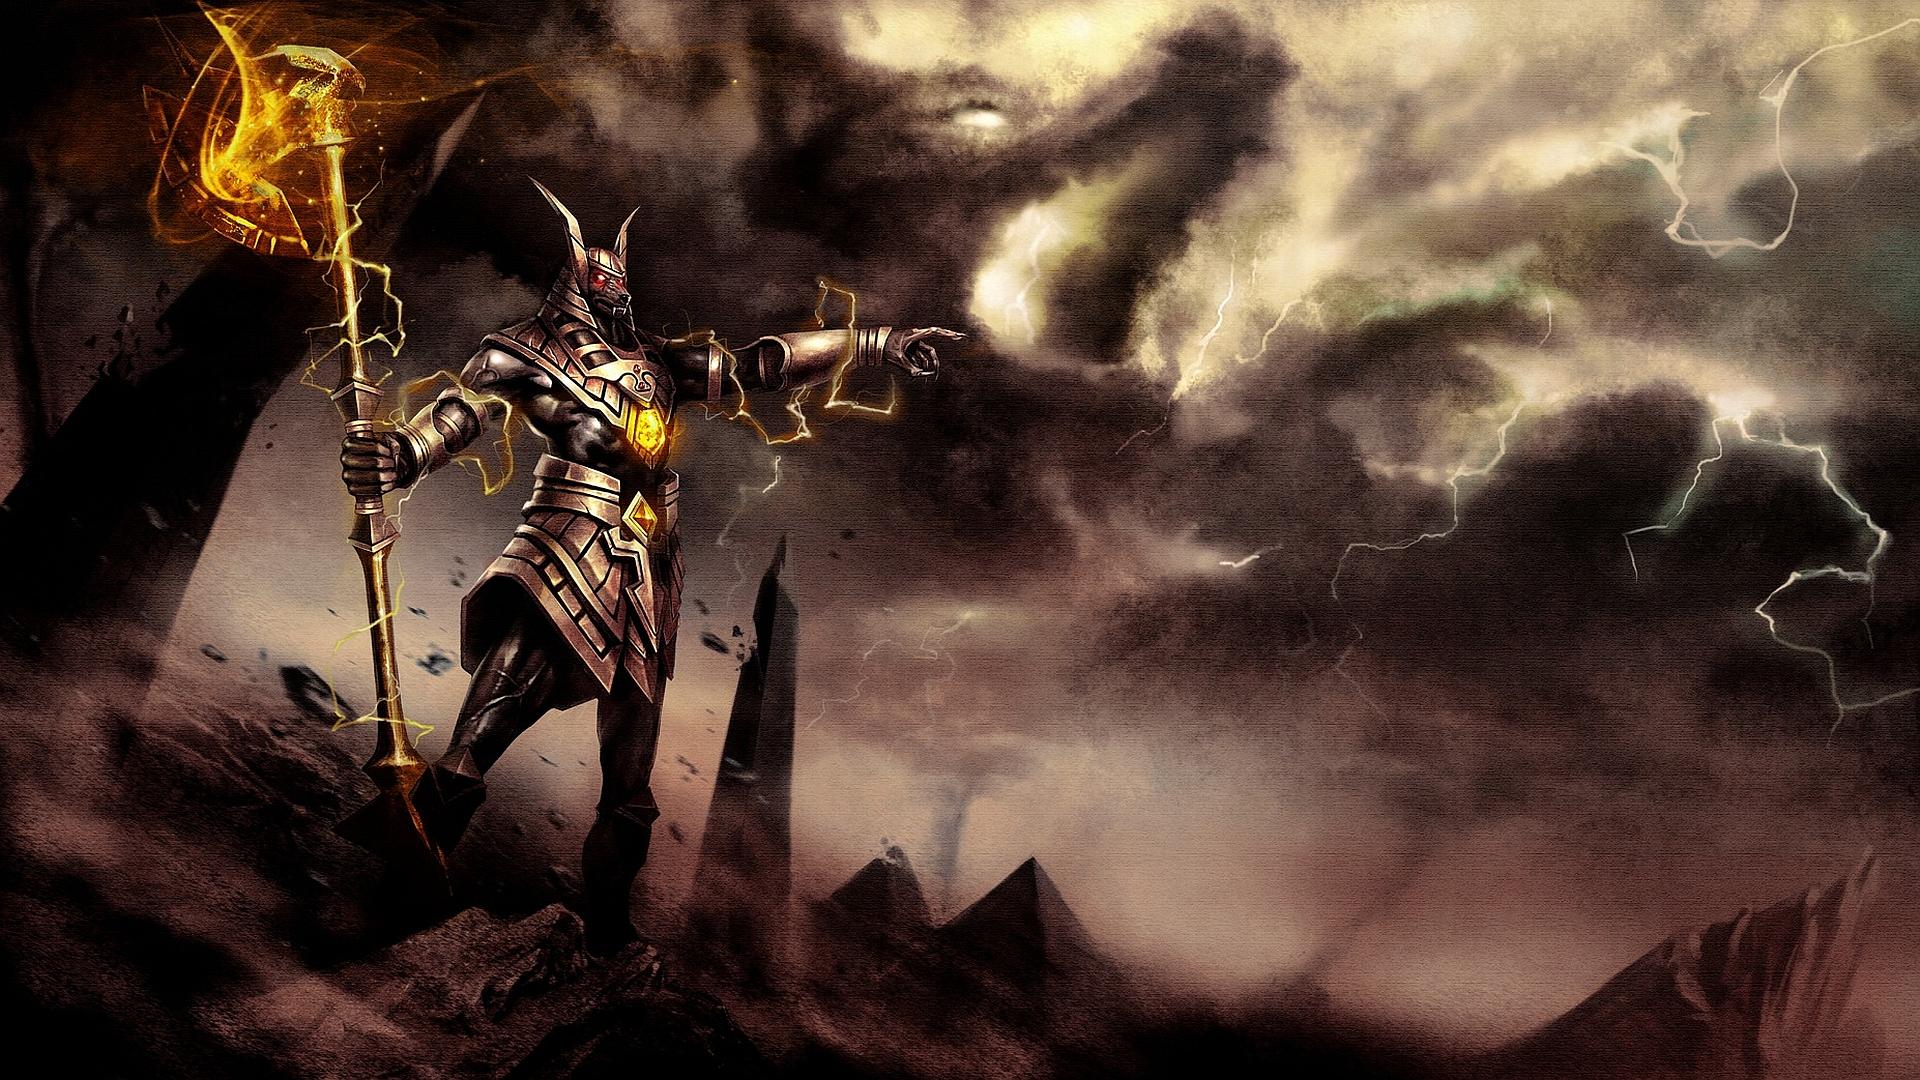 League of Legends wallpaper 125